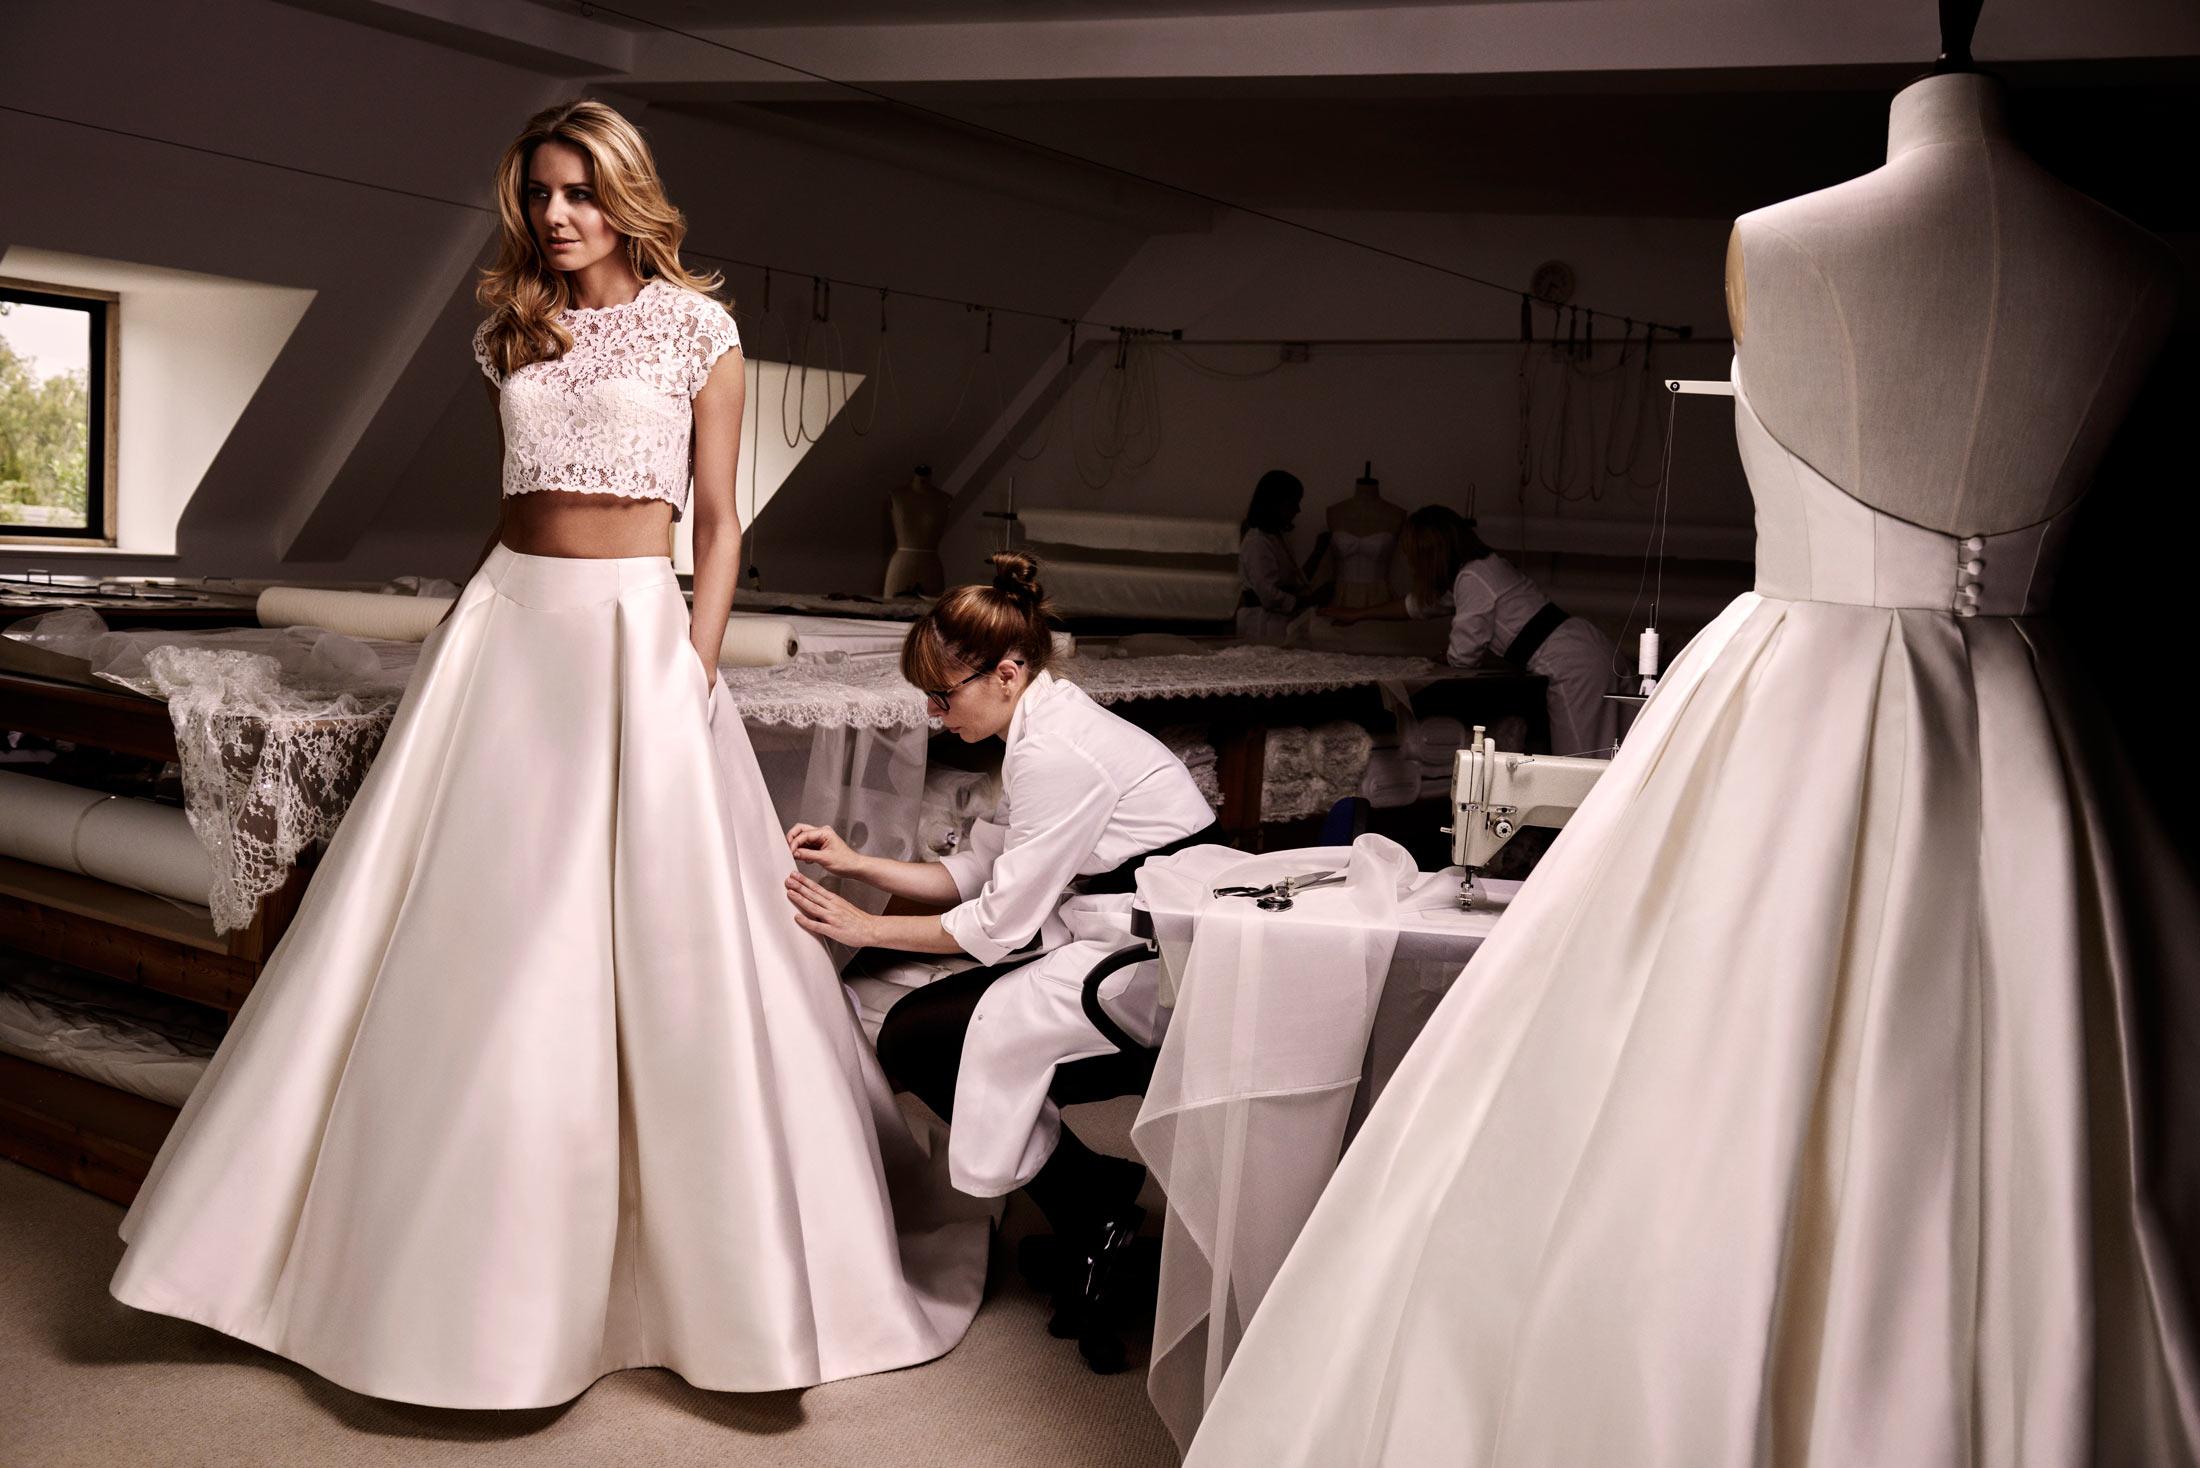 Anya & Agelika designer wedding dress by Caroline Castigliano